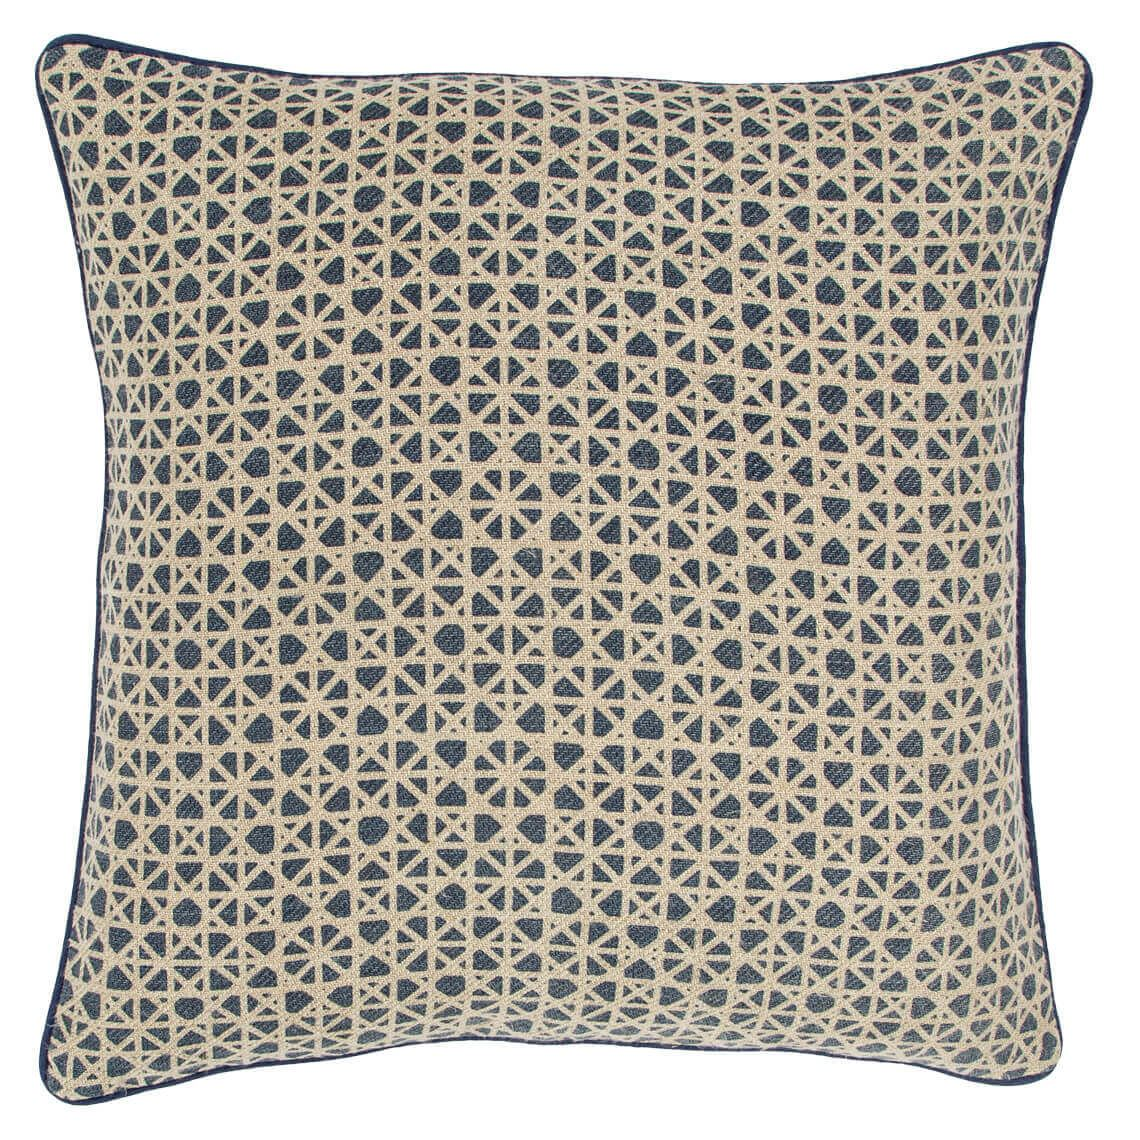 Zanta Cushion Size W 50cm x D 50cm x H 14cm in Indigo 50%cotton/50%linen Freedom